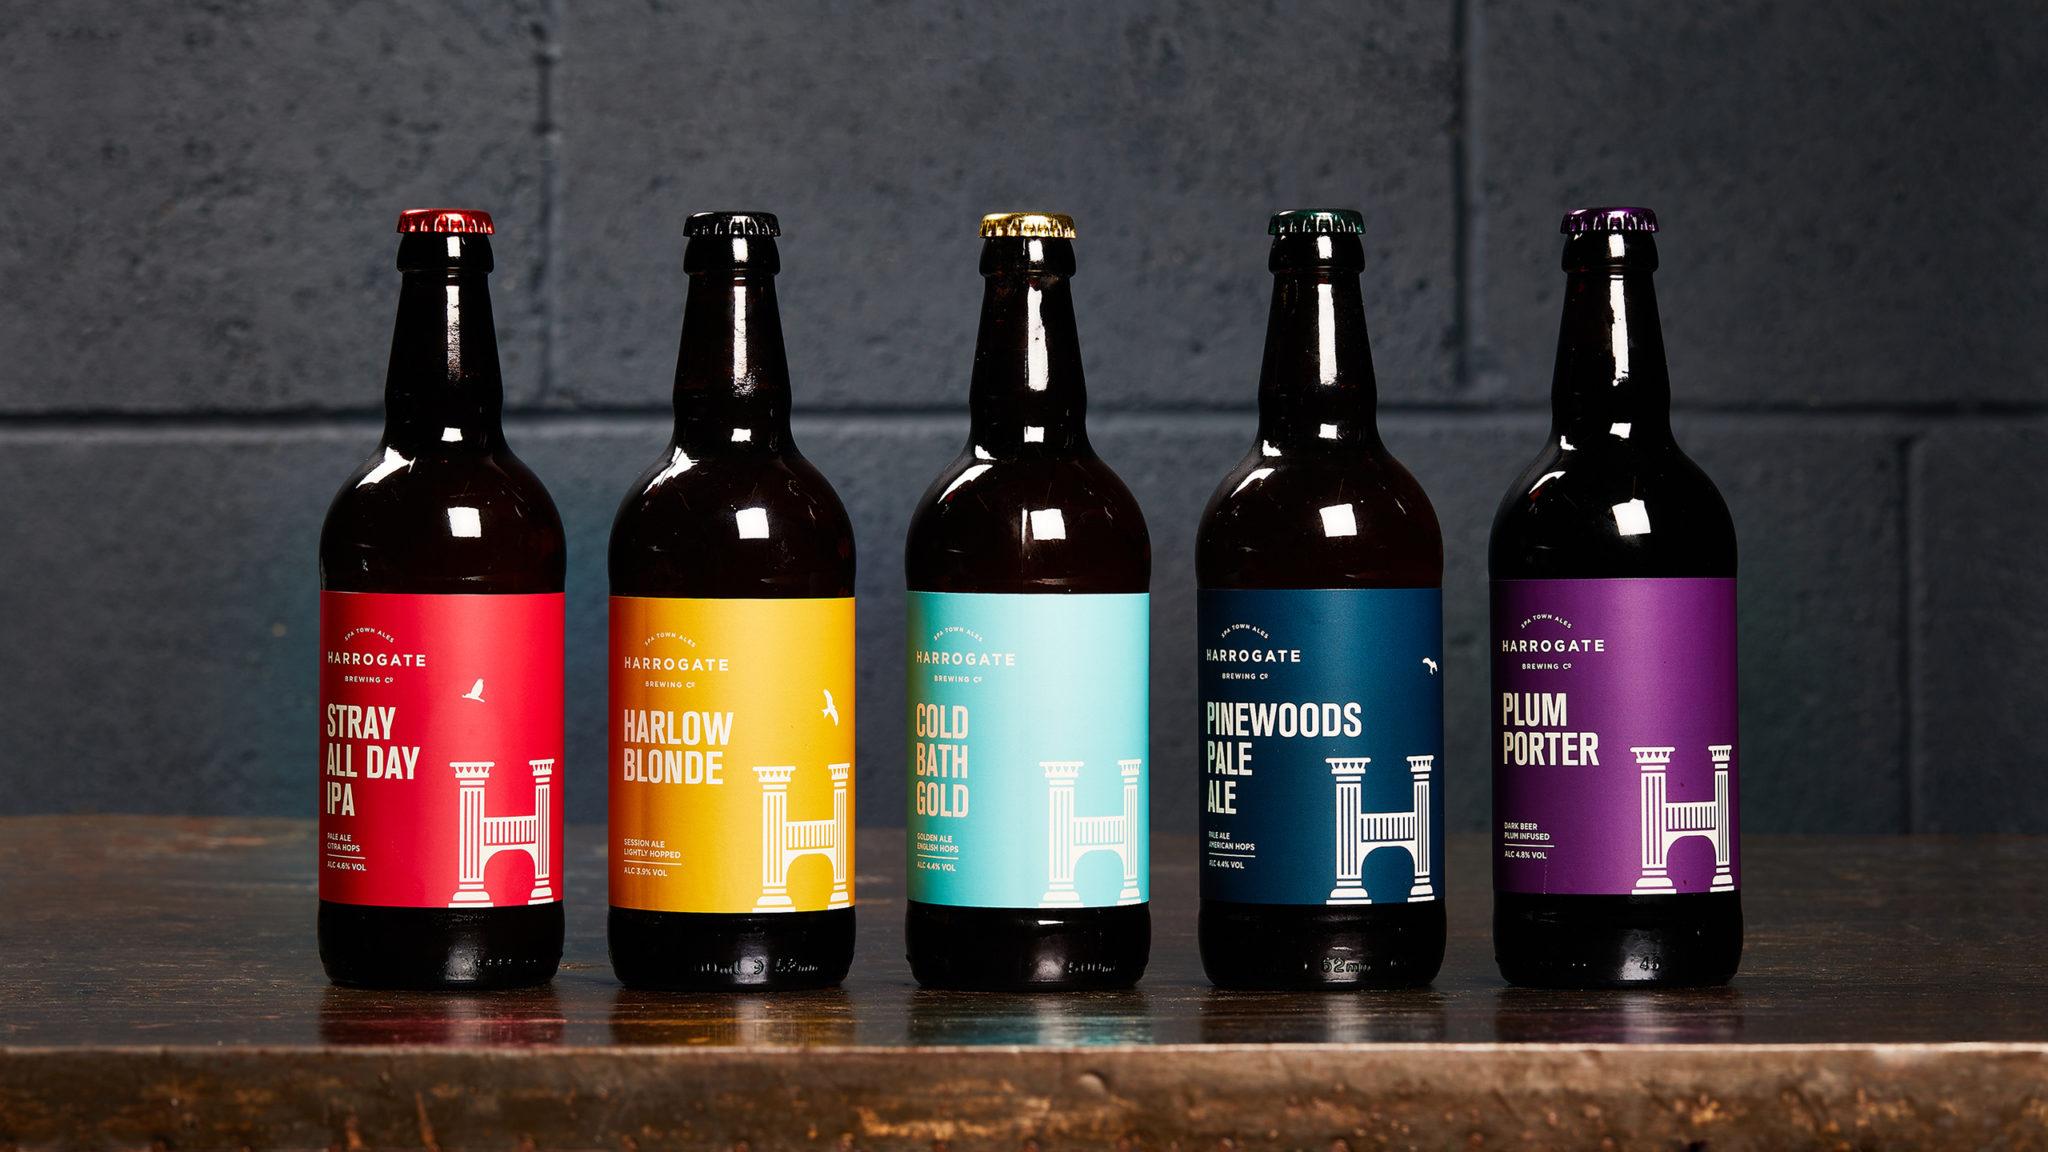 Harrogate Brewing Co. Branding, Beer Bottle Label Design